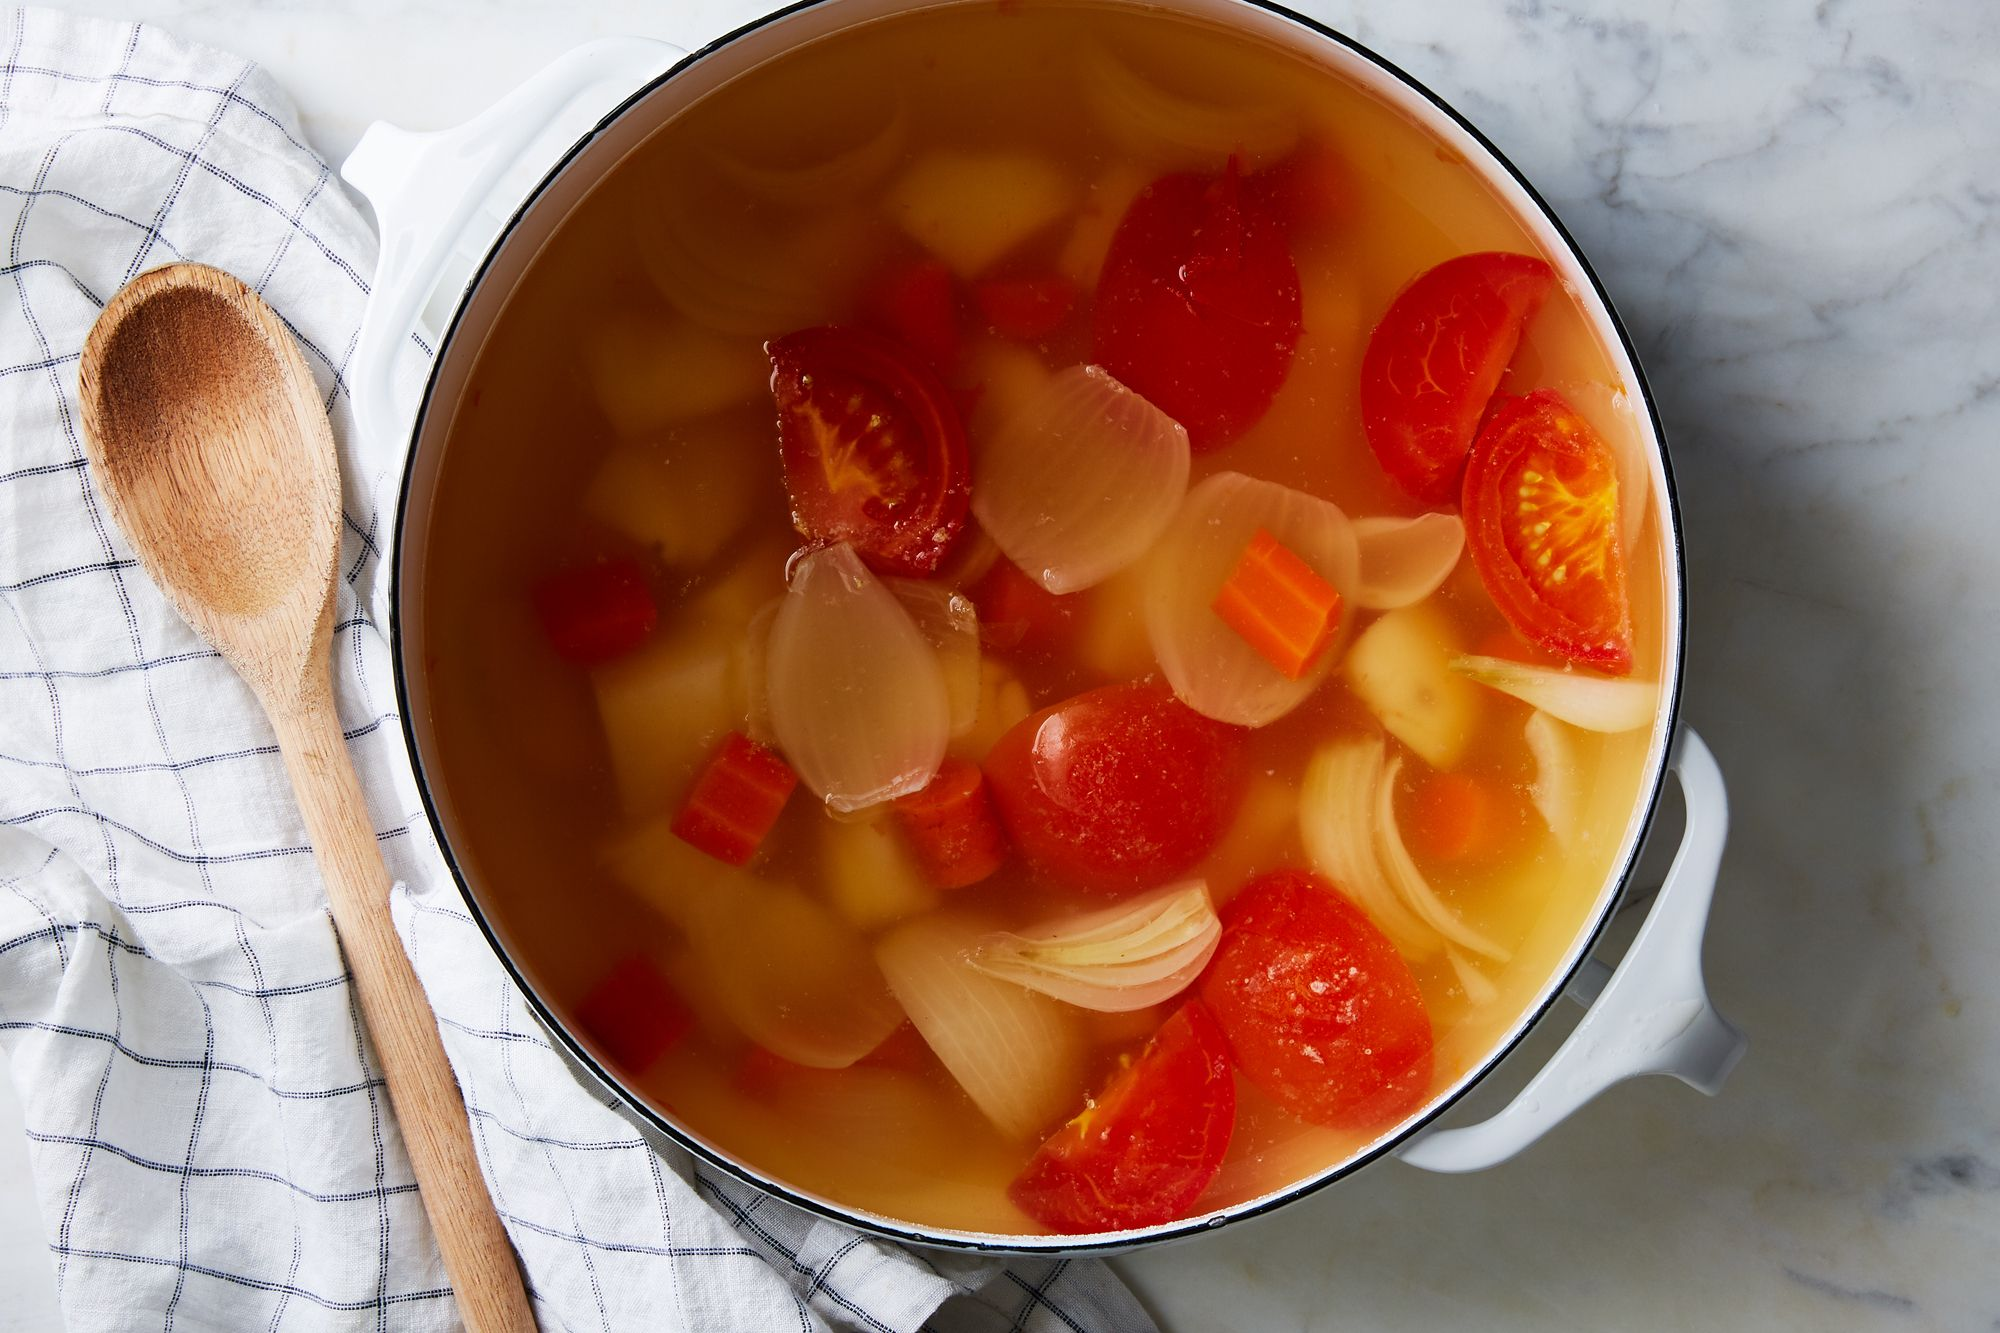 This One Genius Ingredient Will Make Better, Quicker Soups